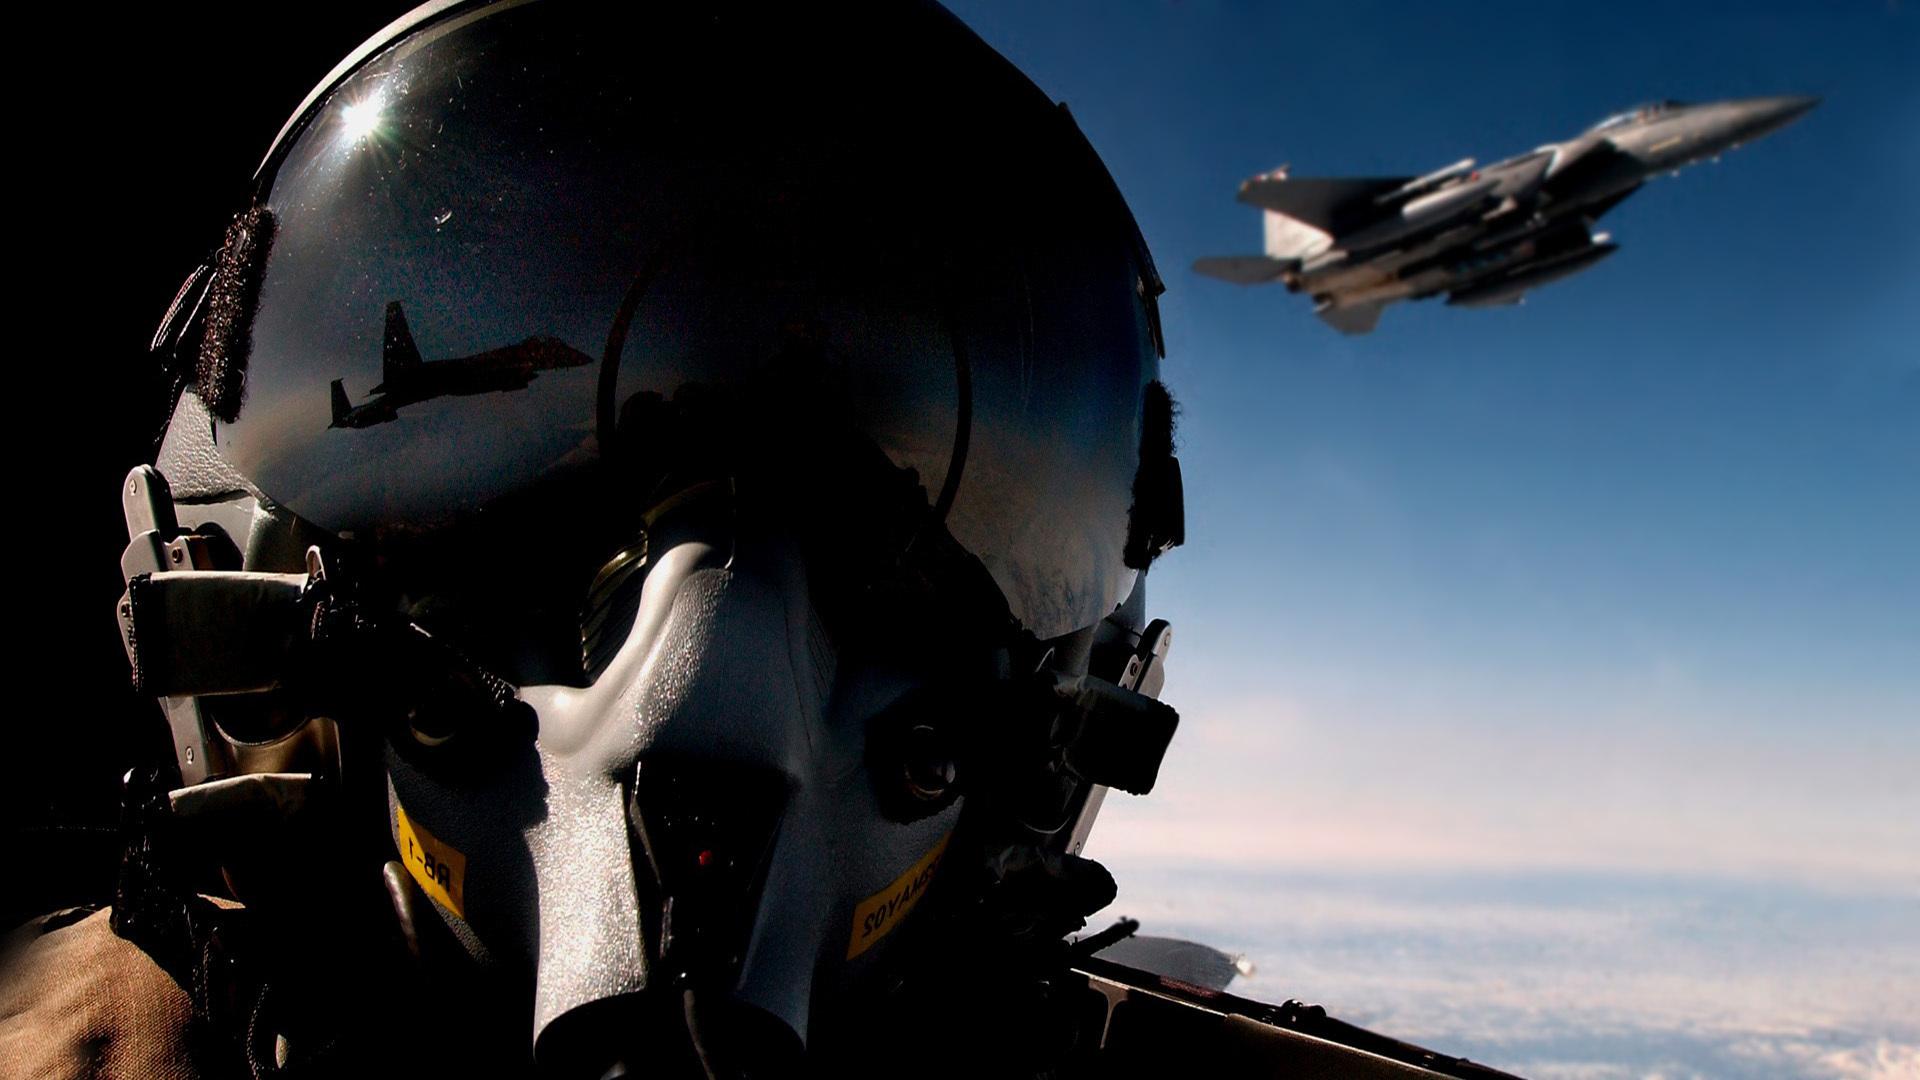 amazing pilot wallpaper 36653